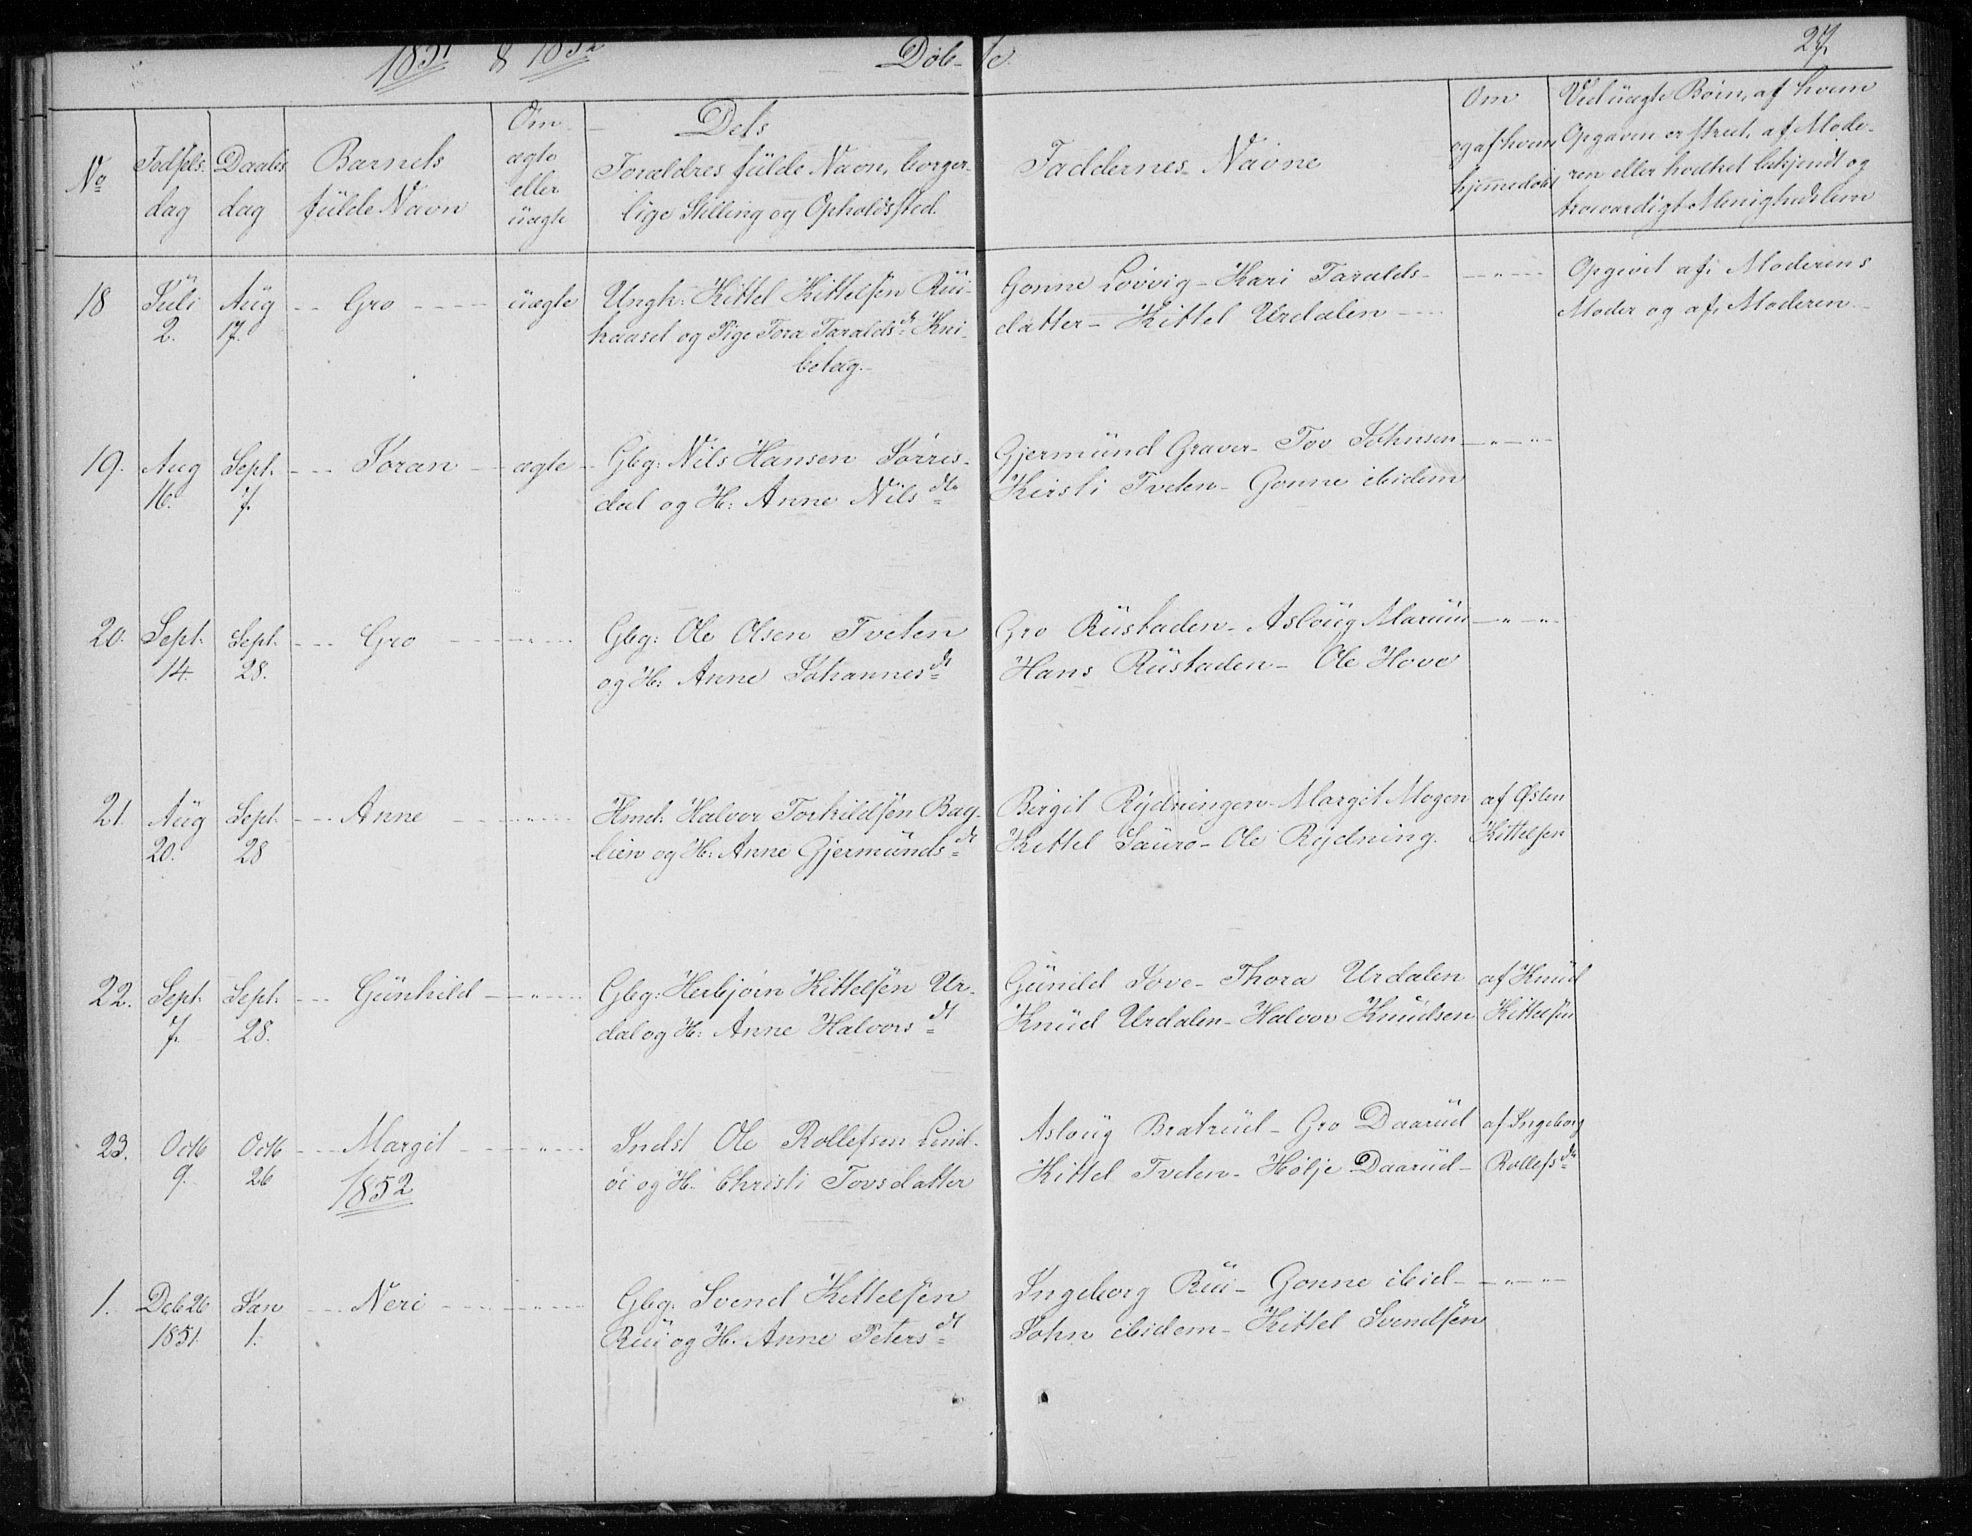 SAKO, Gransherad kirkebøker, F/Fb/L0003: Ministerialbok nr. II 3, 1844-1859, s. 27